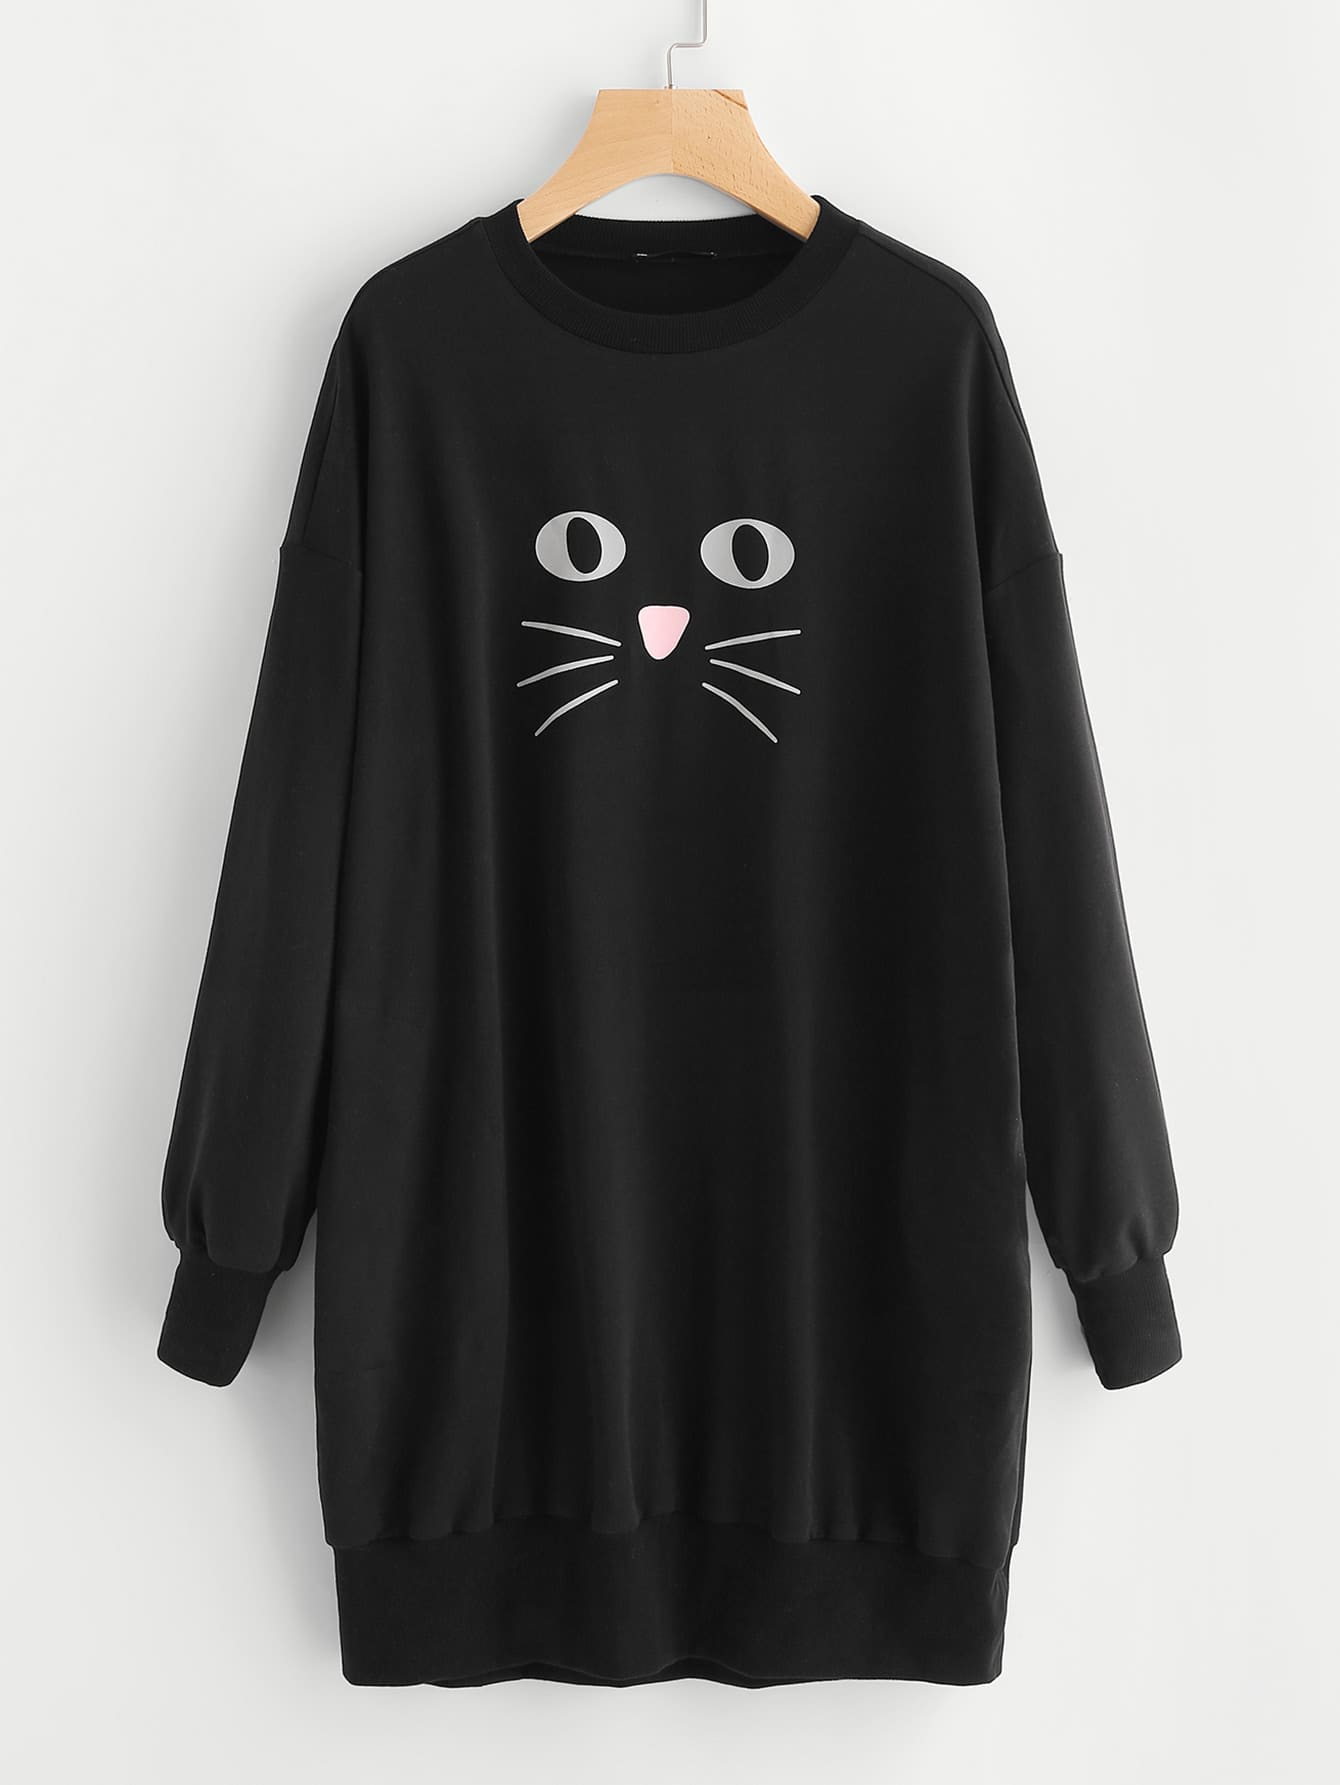 Cat Print Drop Shoulder Sweatshirt Dress plus size drop shoulder christmas cat print pullover sweatshirt